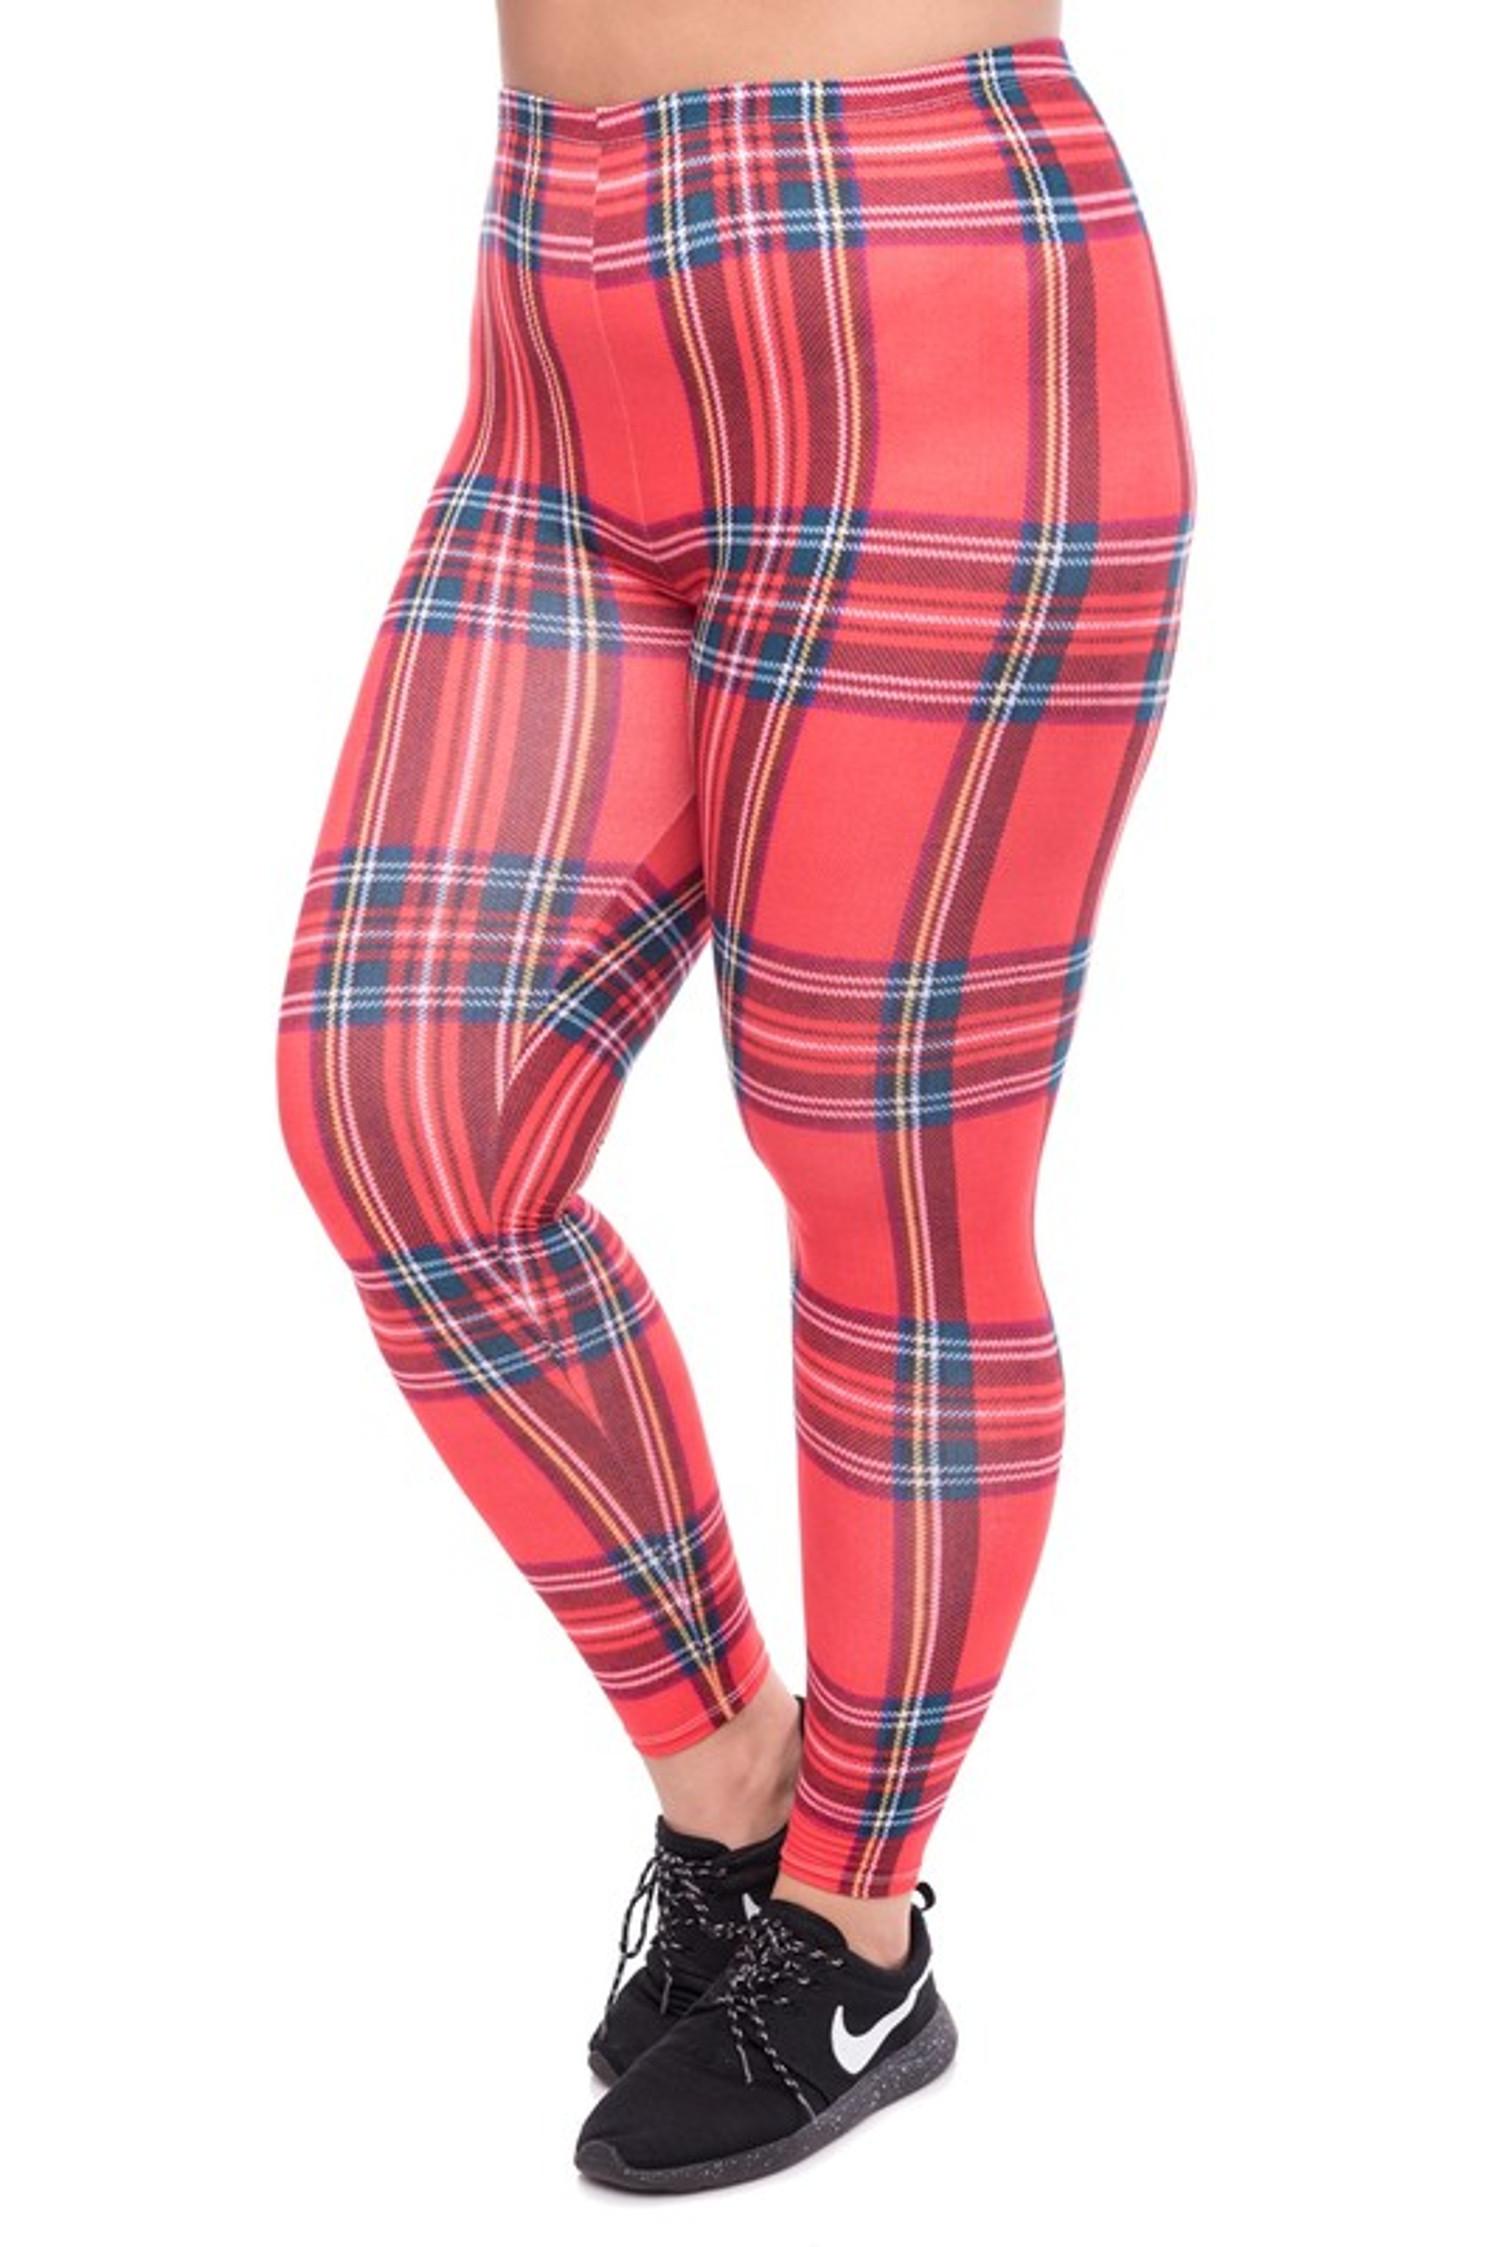 Everyday Red Plaid Leggings - Plus Size